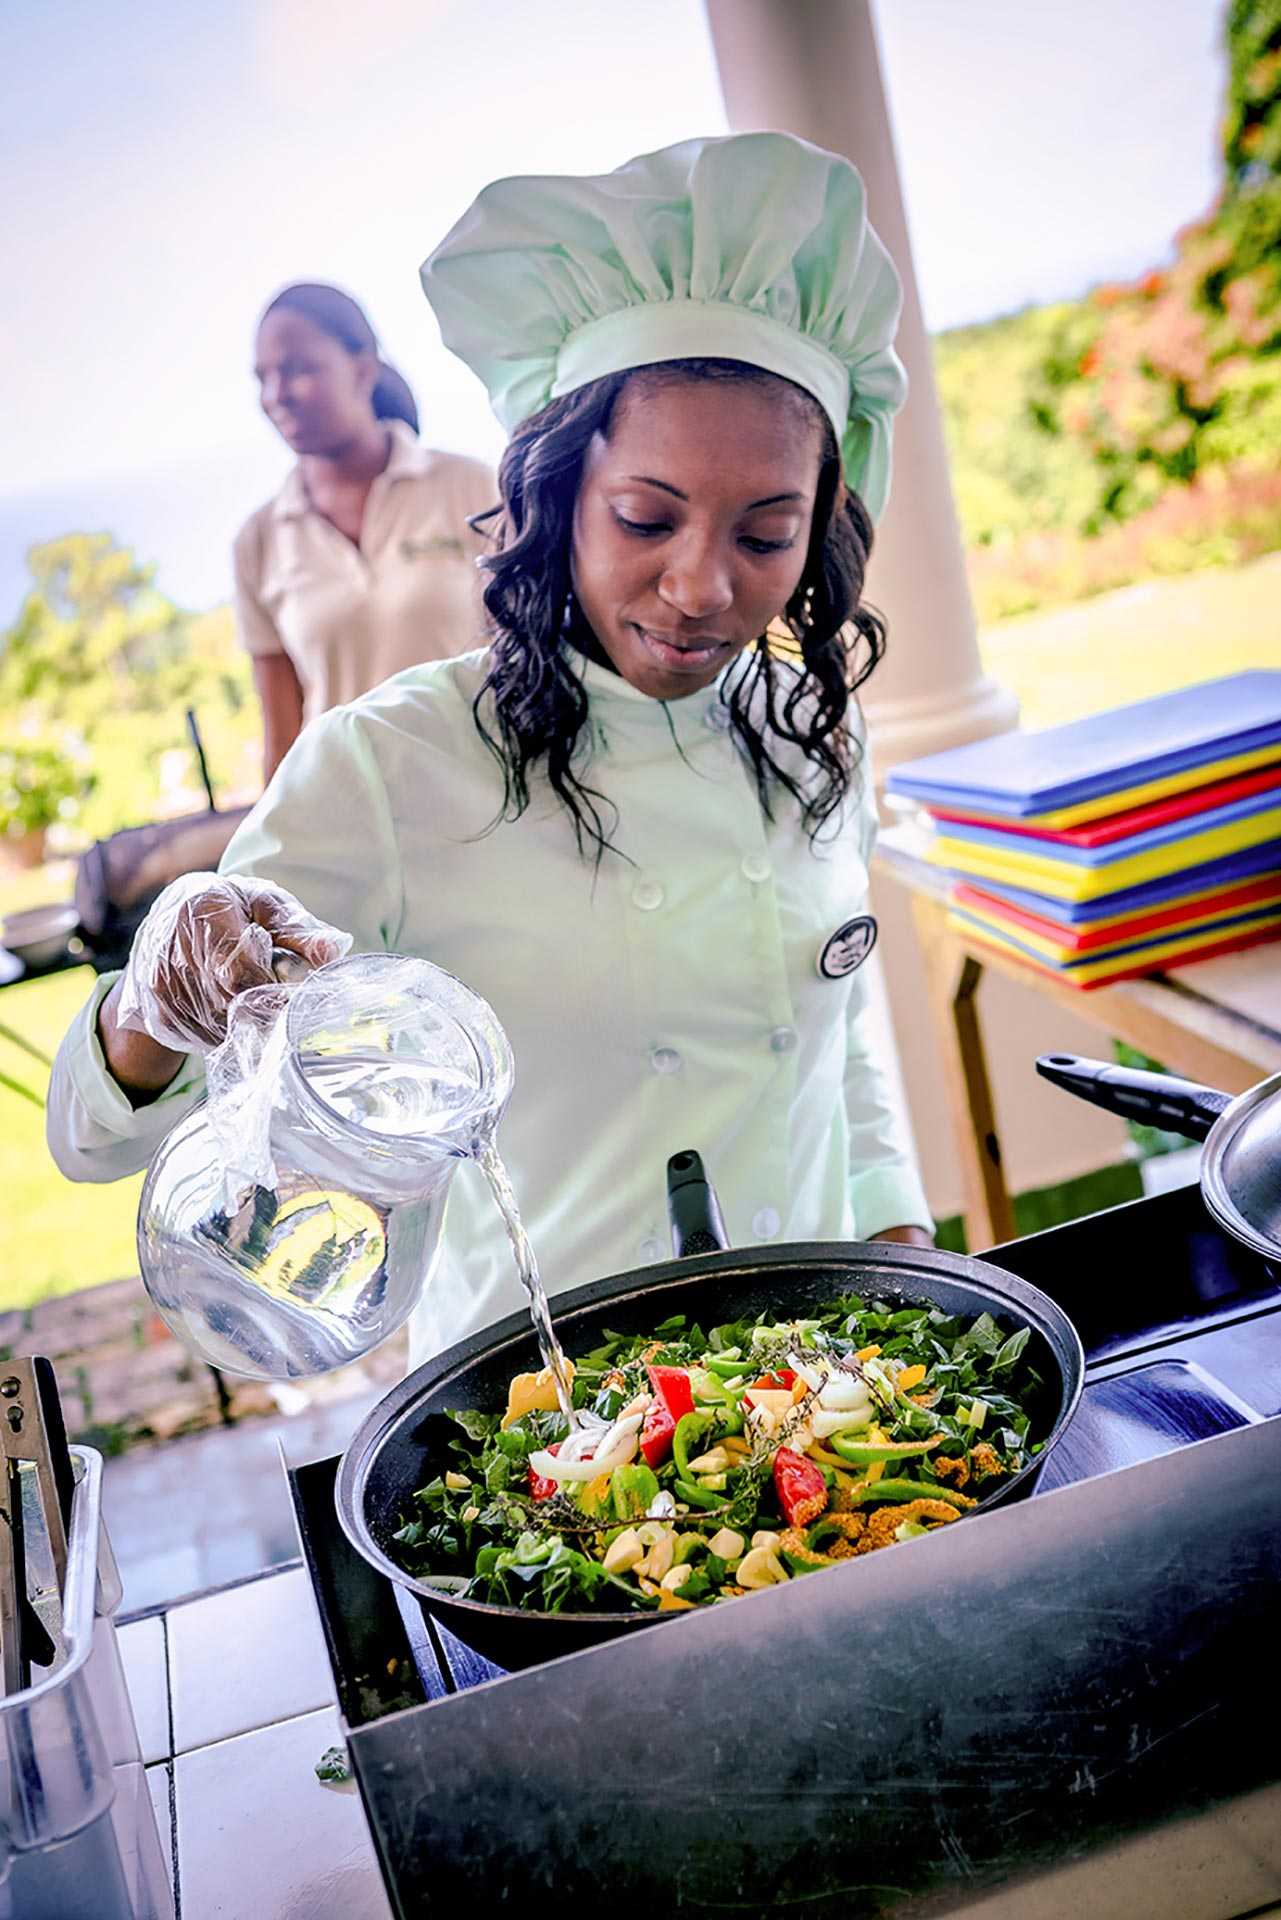 Jamaican chef preparing food